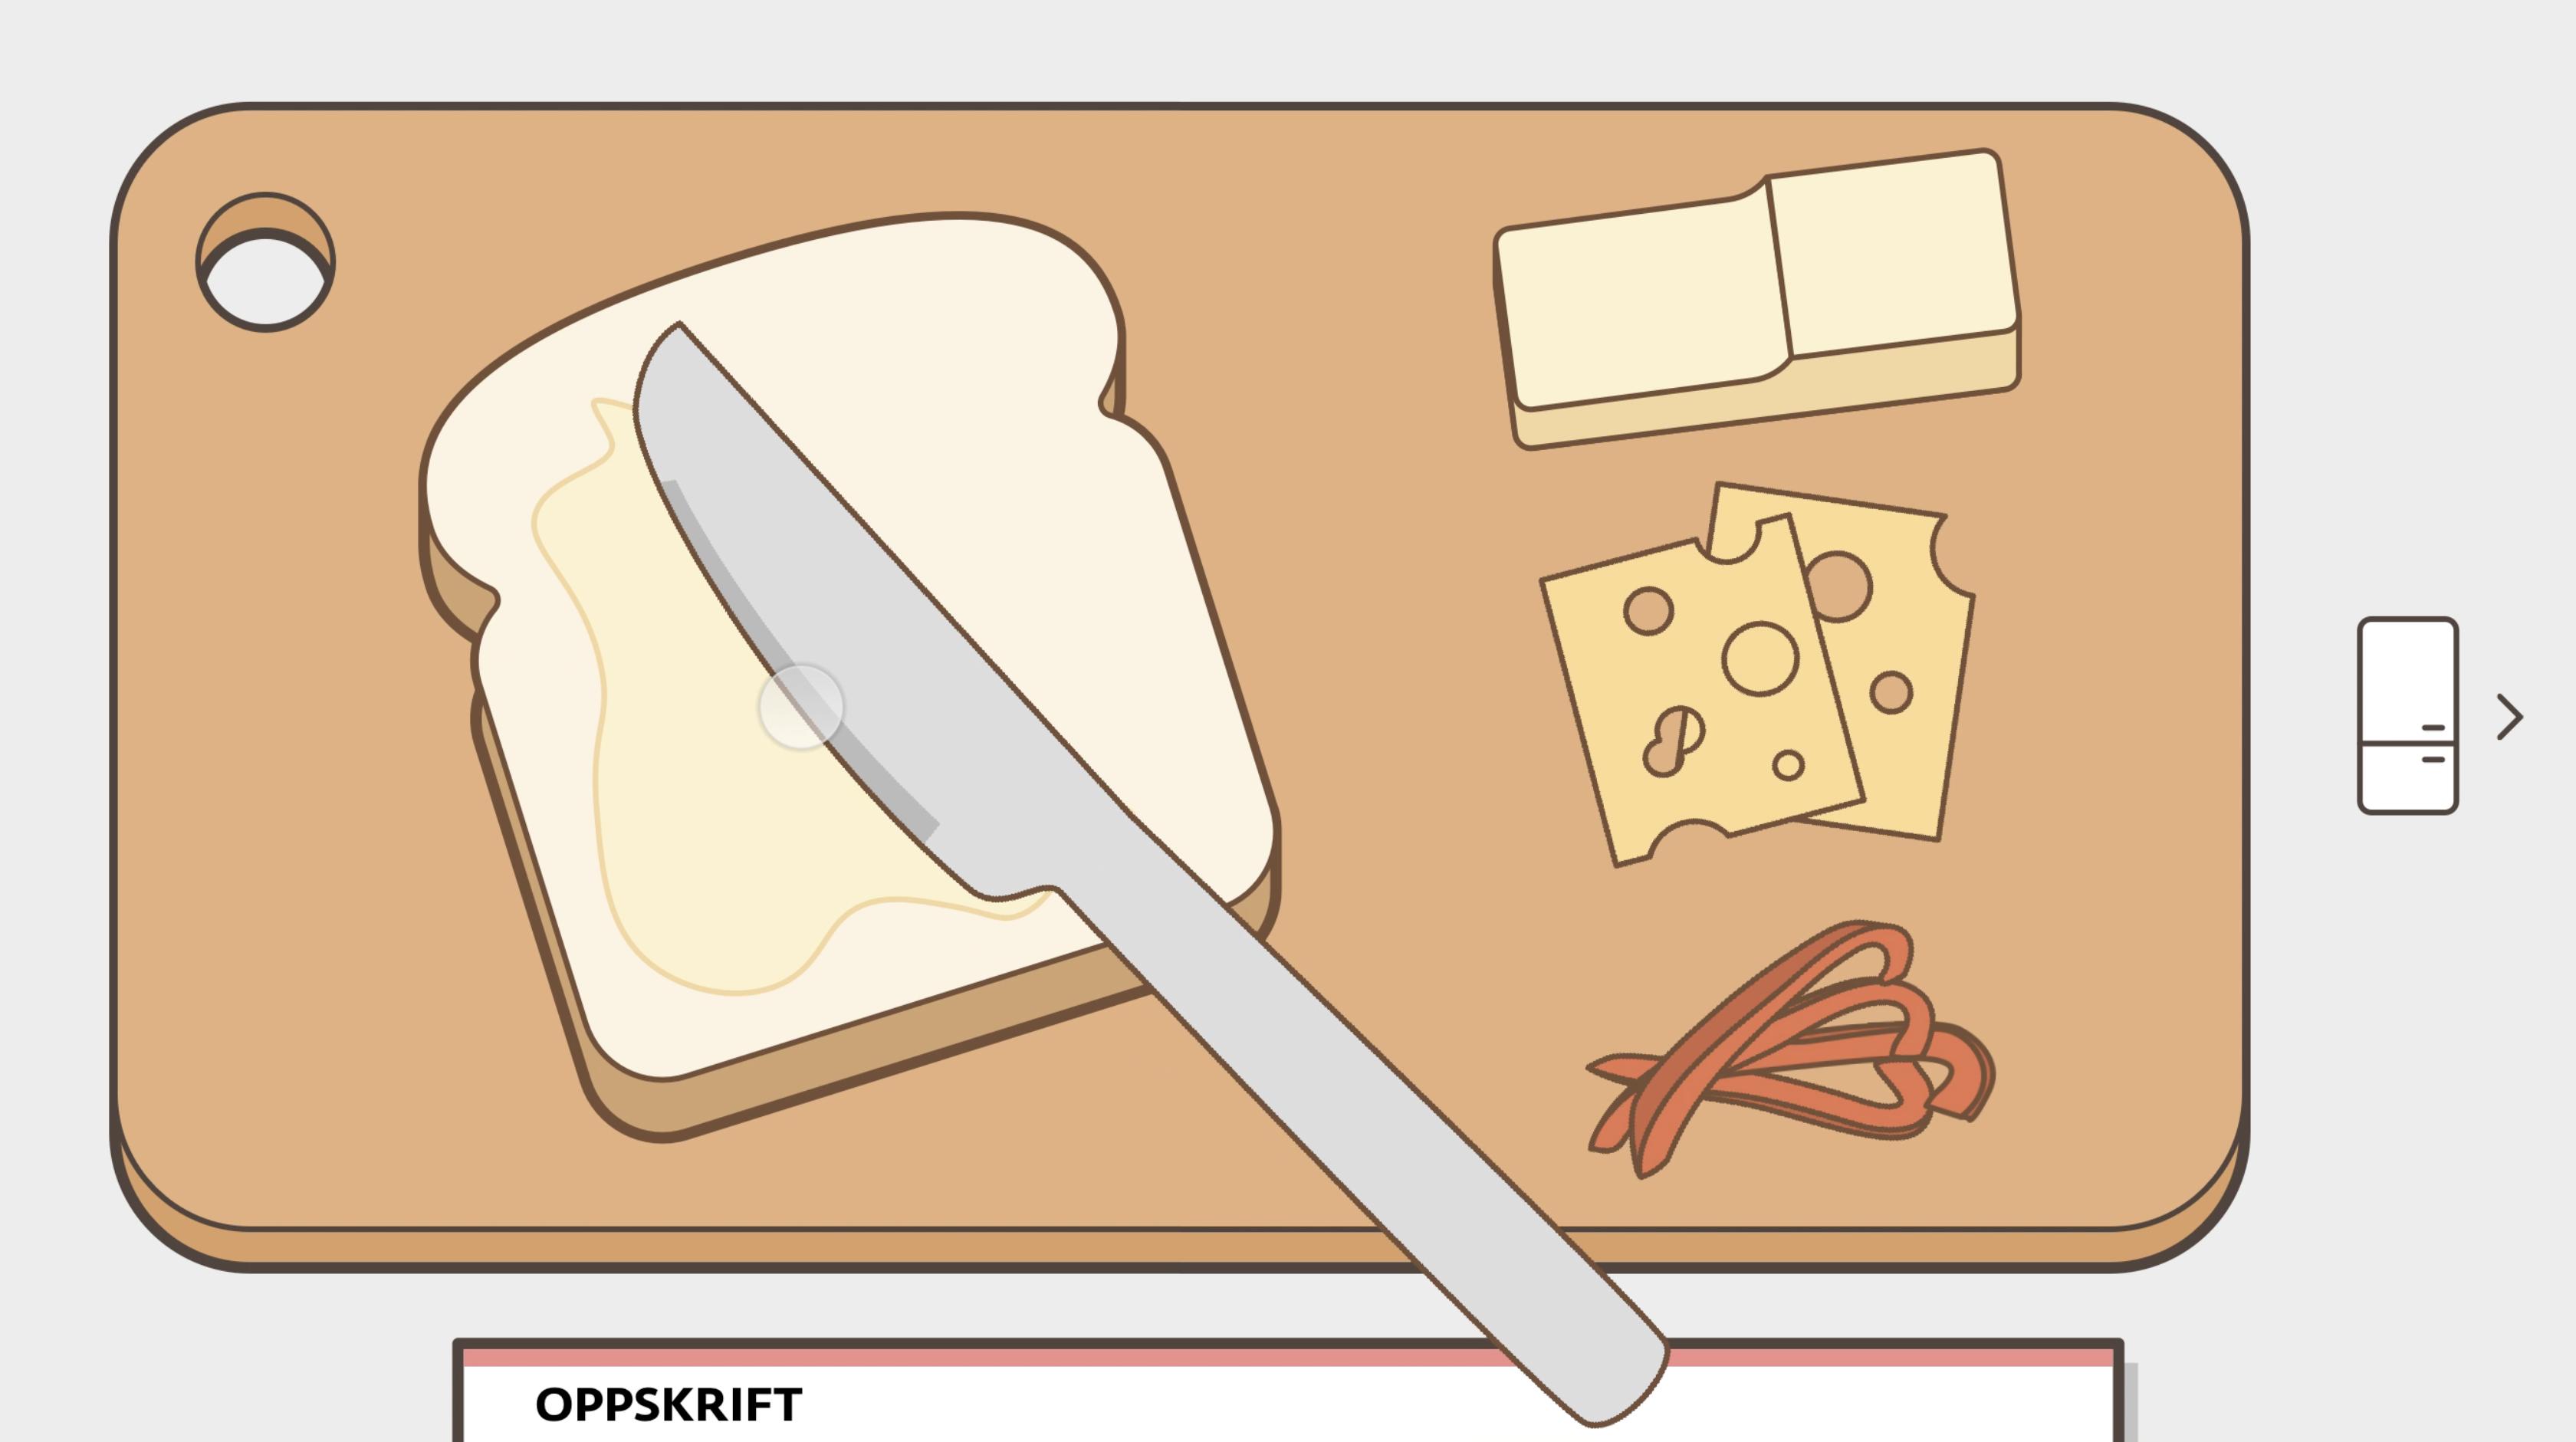 Principle is importing sketch files as cliparts clipart free Principle, make me a sandwich. - Bekk clipart free